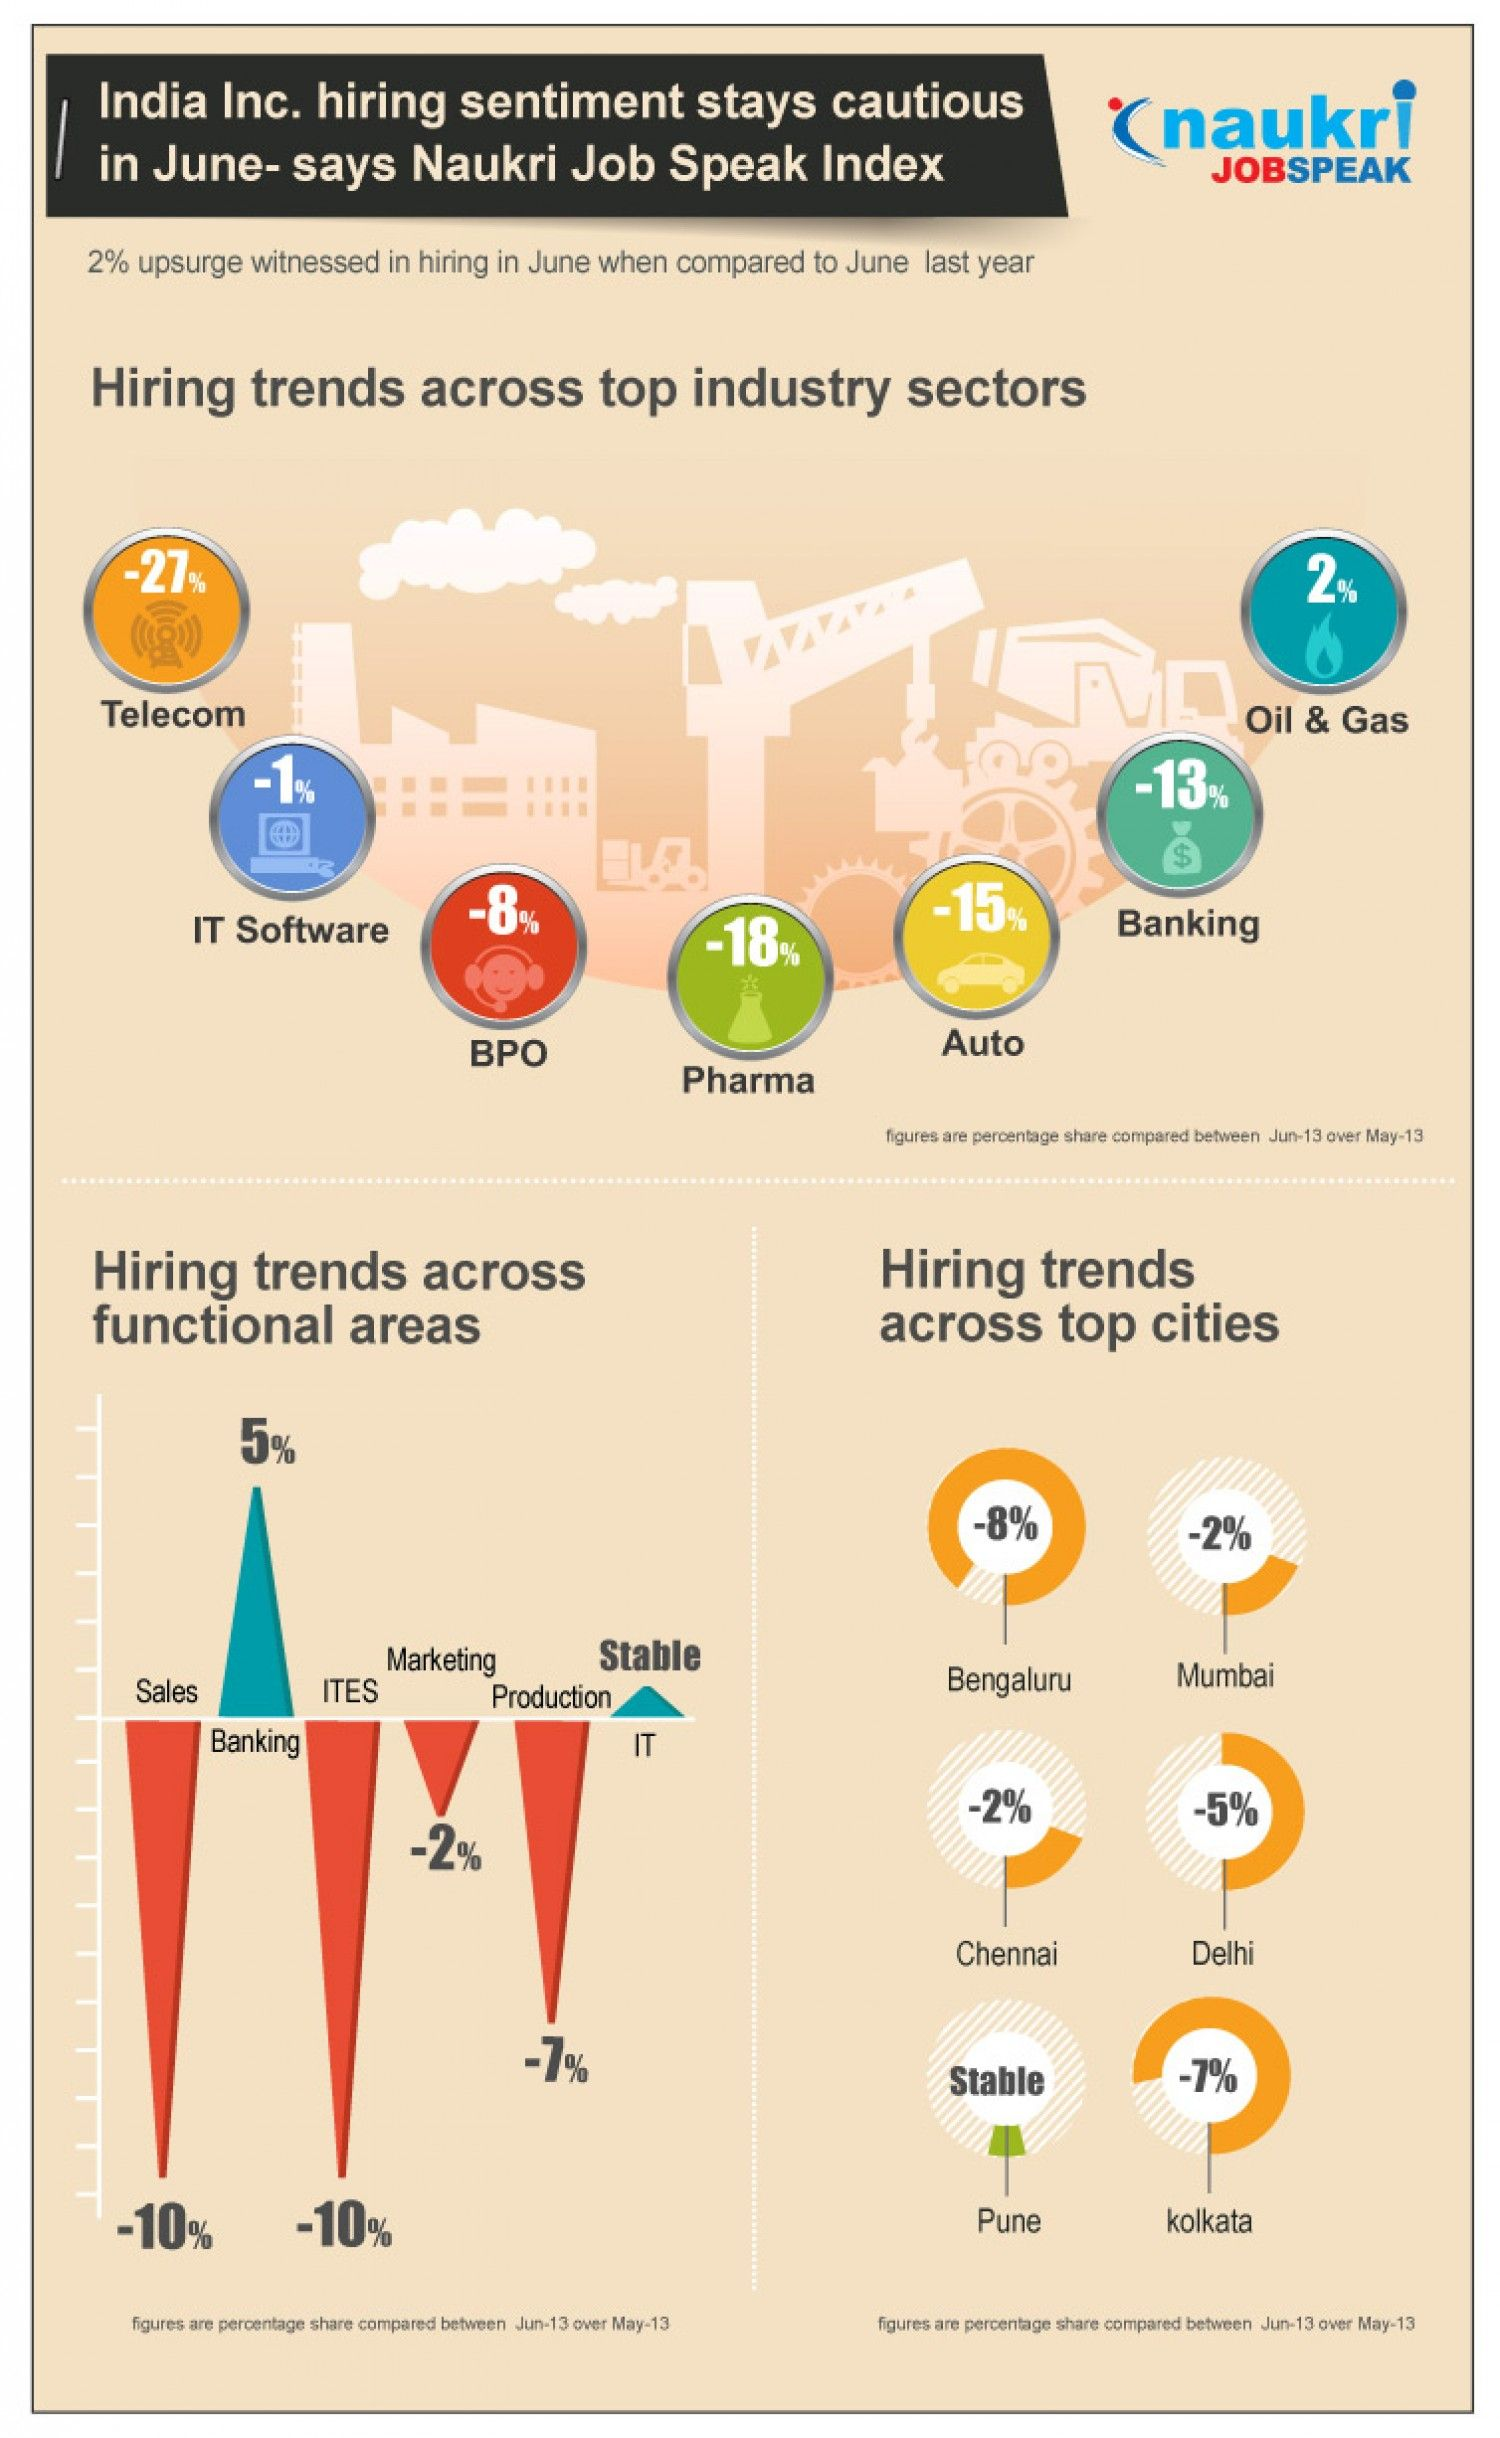 Hiring Trends Across Top Industry Sectors Job Industry Sectors Oil And Gas